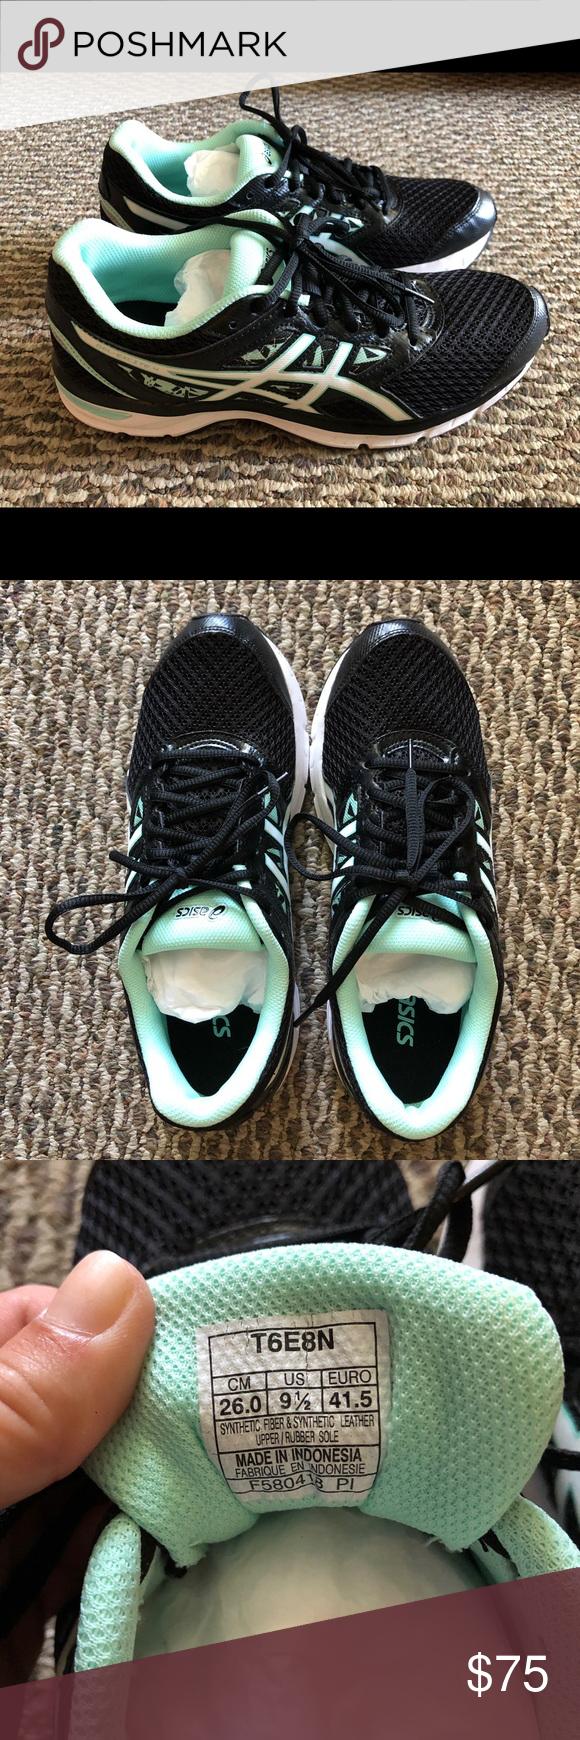 Women's ASICS Gel Excite 4 Brand new women's running shoes